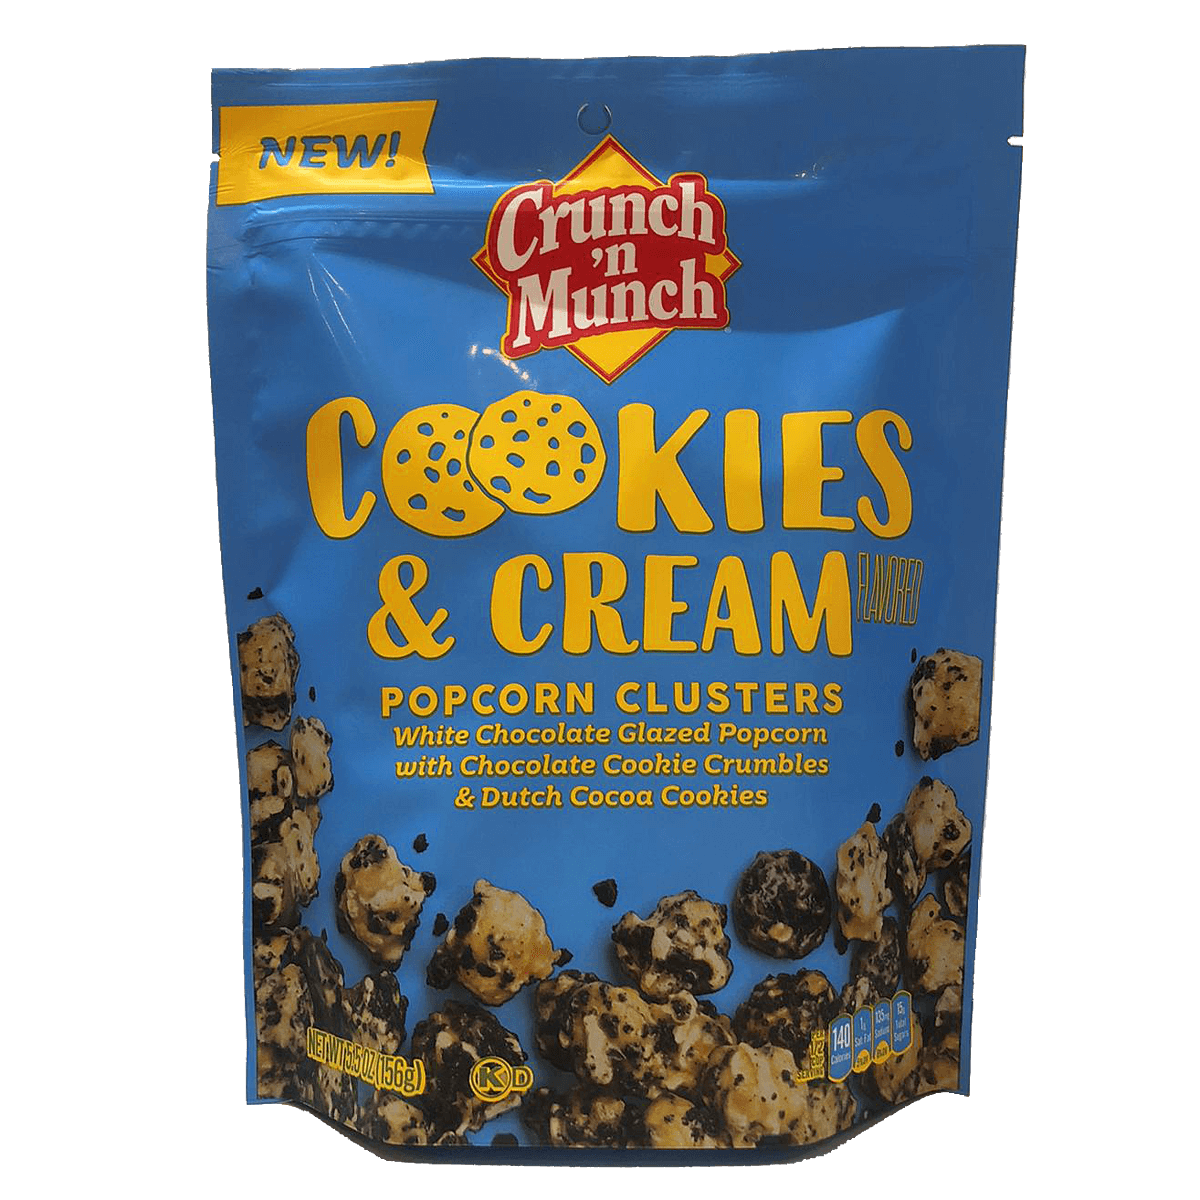 Crunch´n Munch Cookies & Cream Popcorn Clusters 156 g